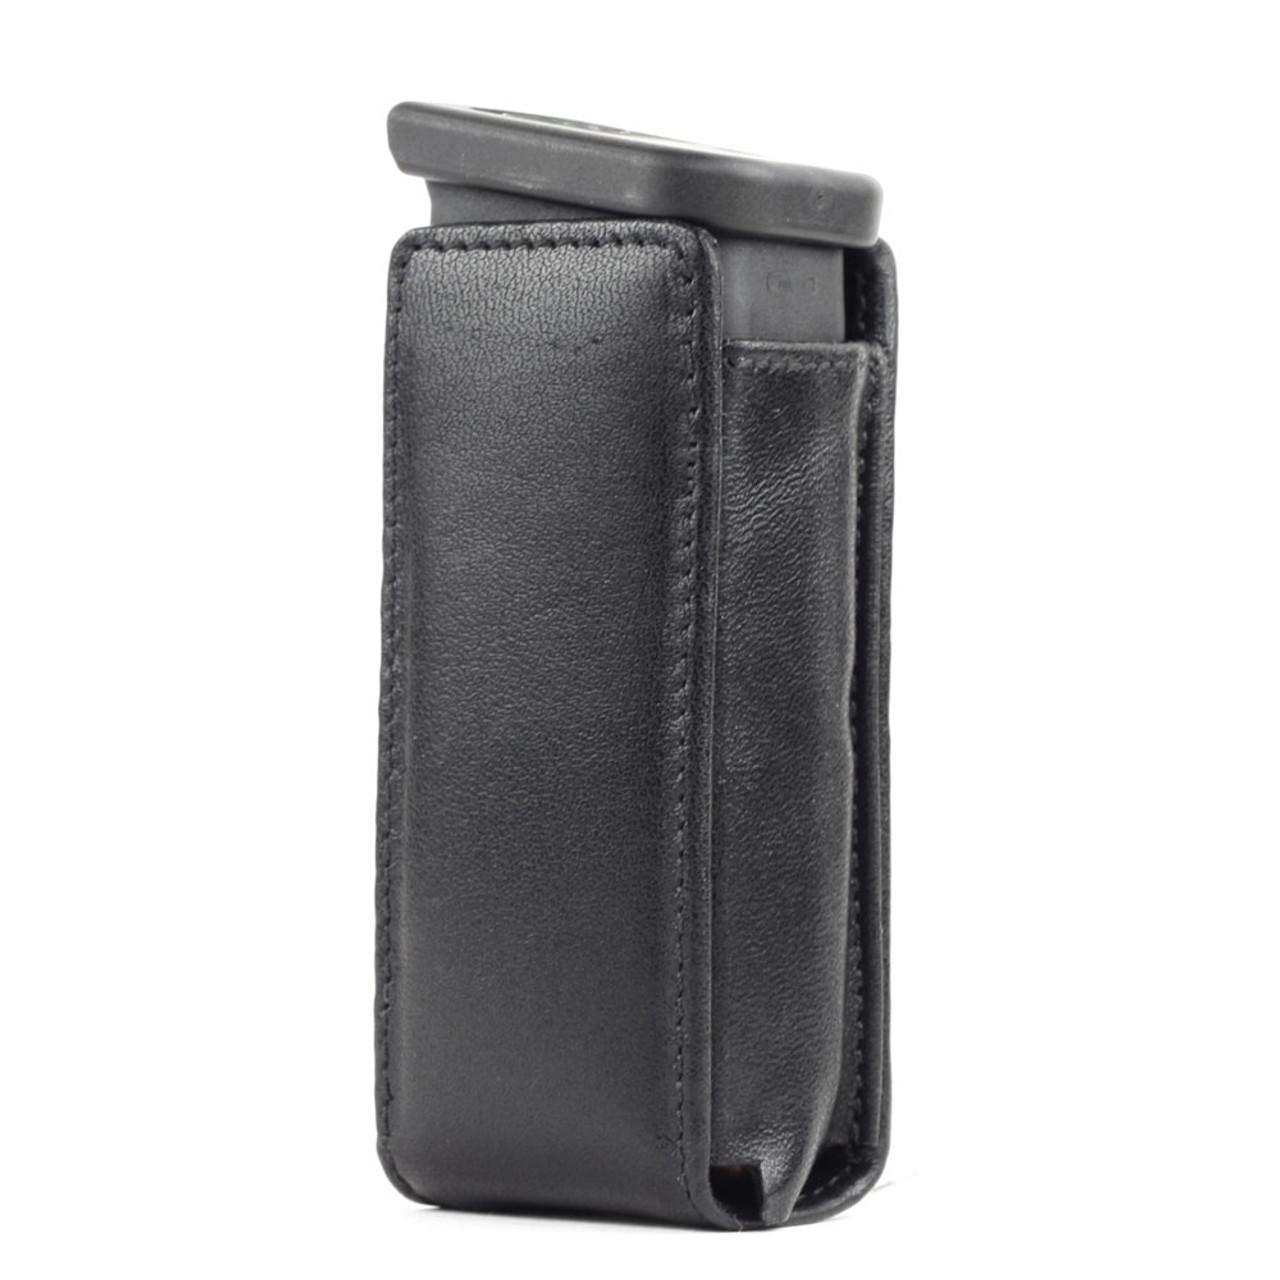 Glock 48 Magazine Pocket Protector